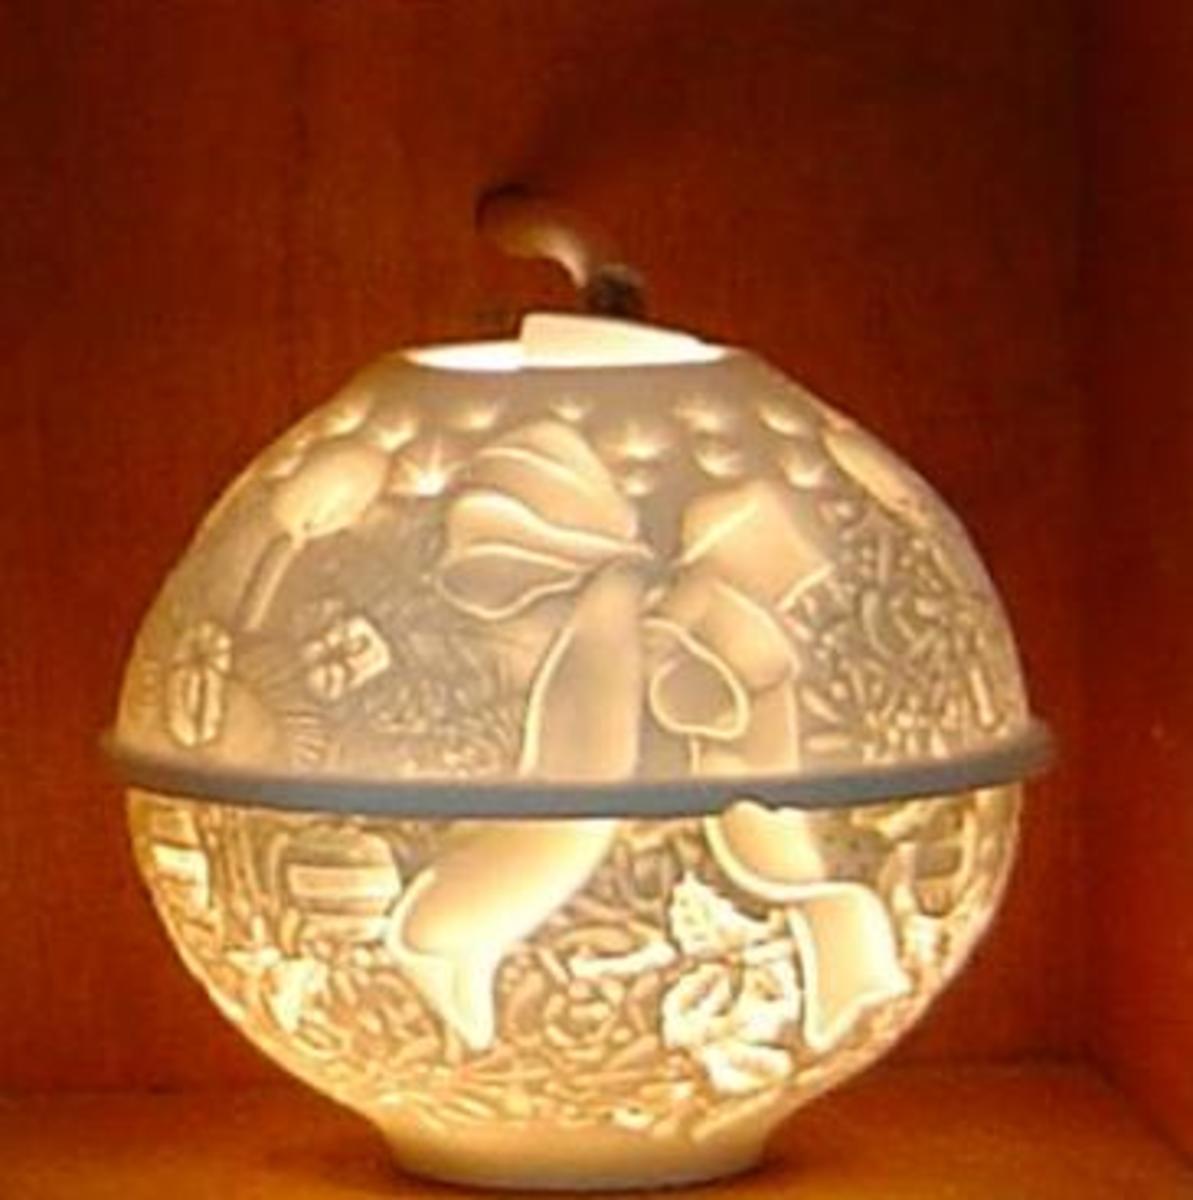 Limoges porcelain lamp from Deshoulieres factory outlet, Limoges